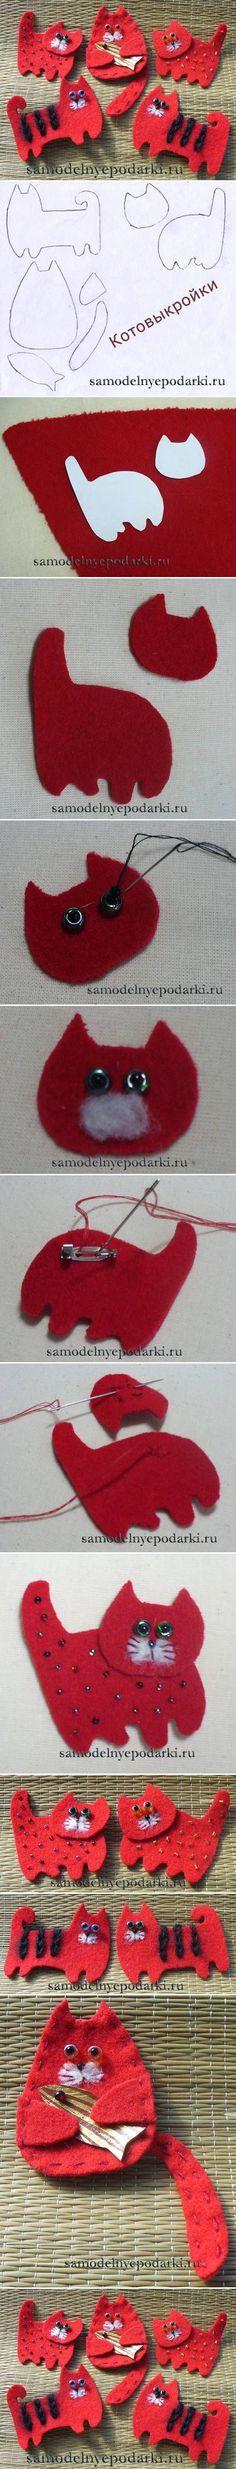 DIY Fabric Cat Brooch                                                                                                                                                                                 More